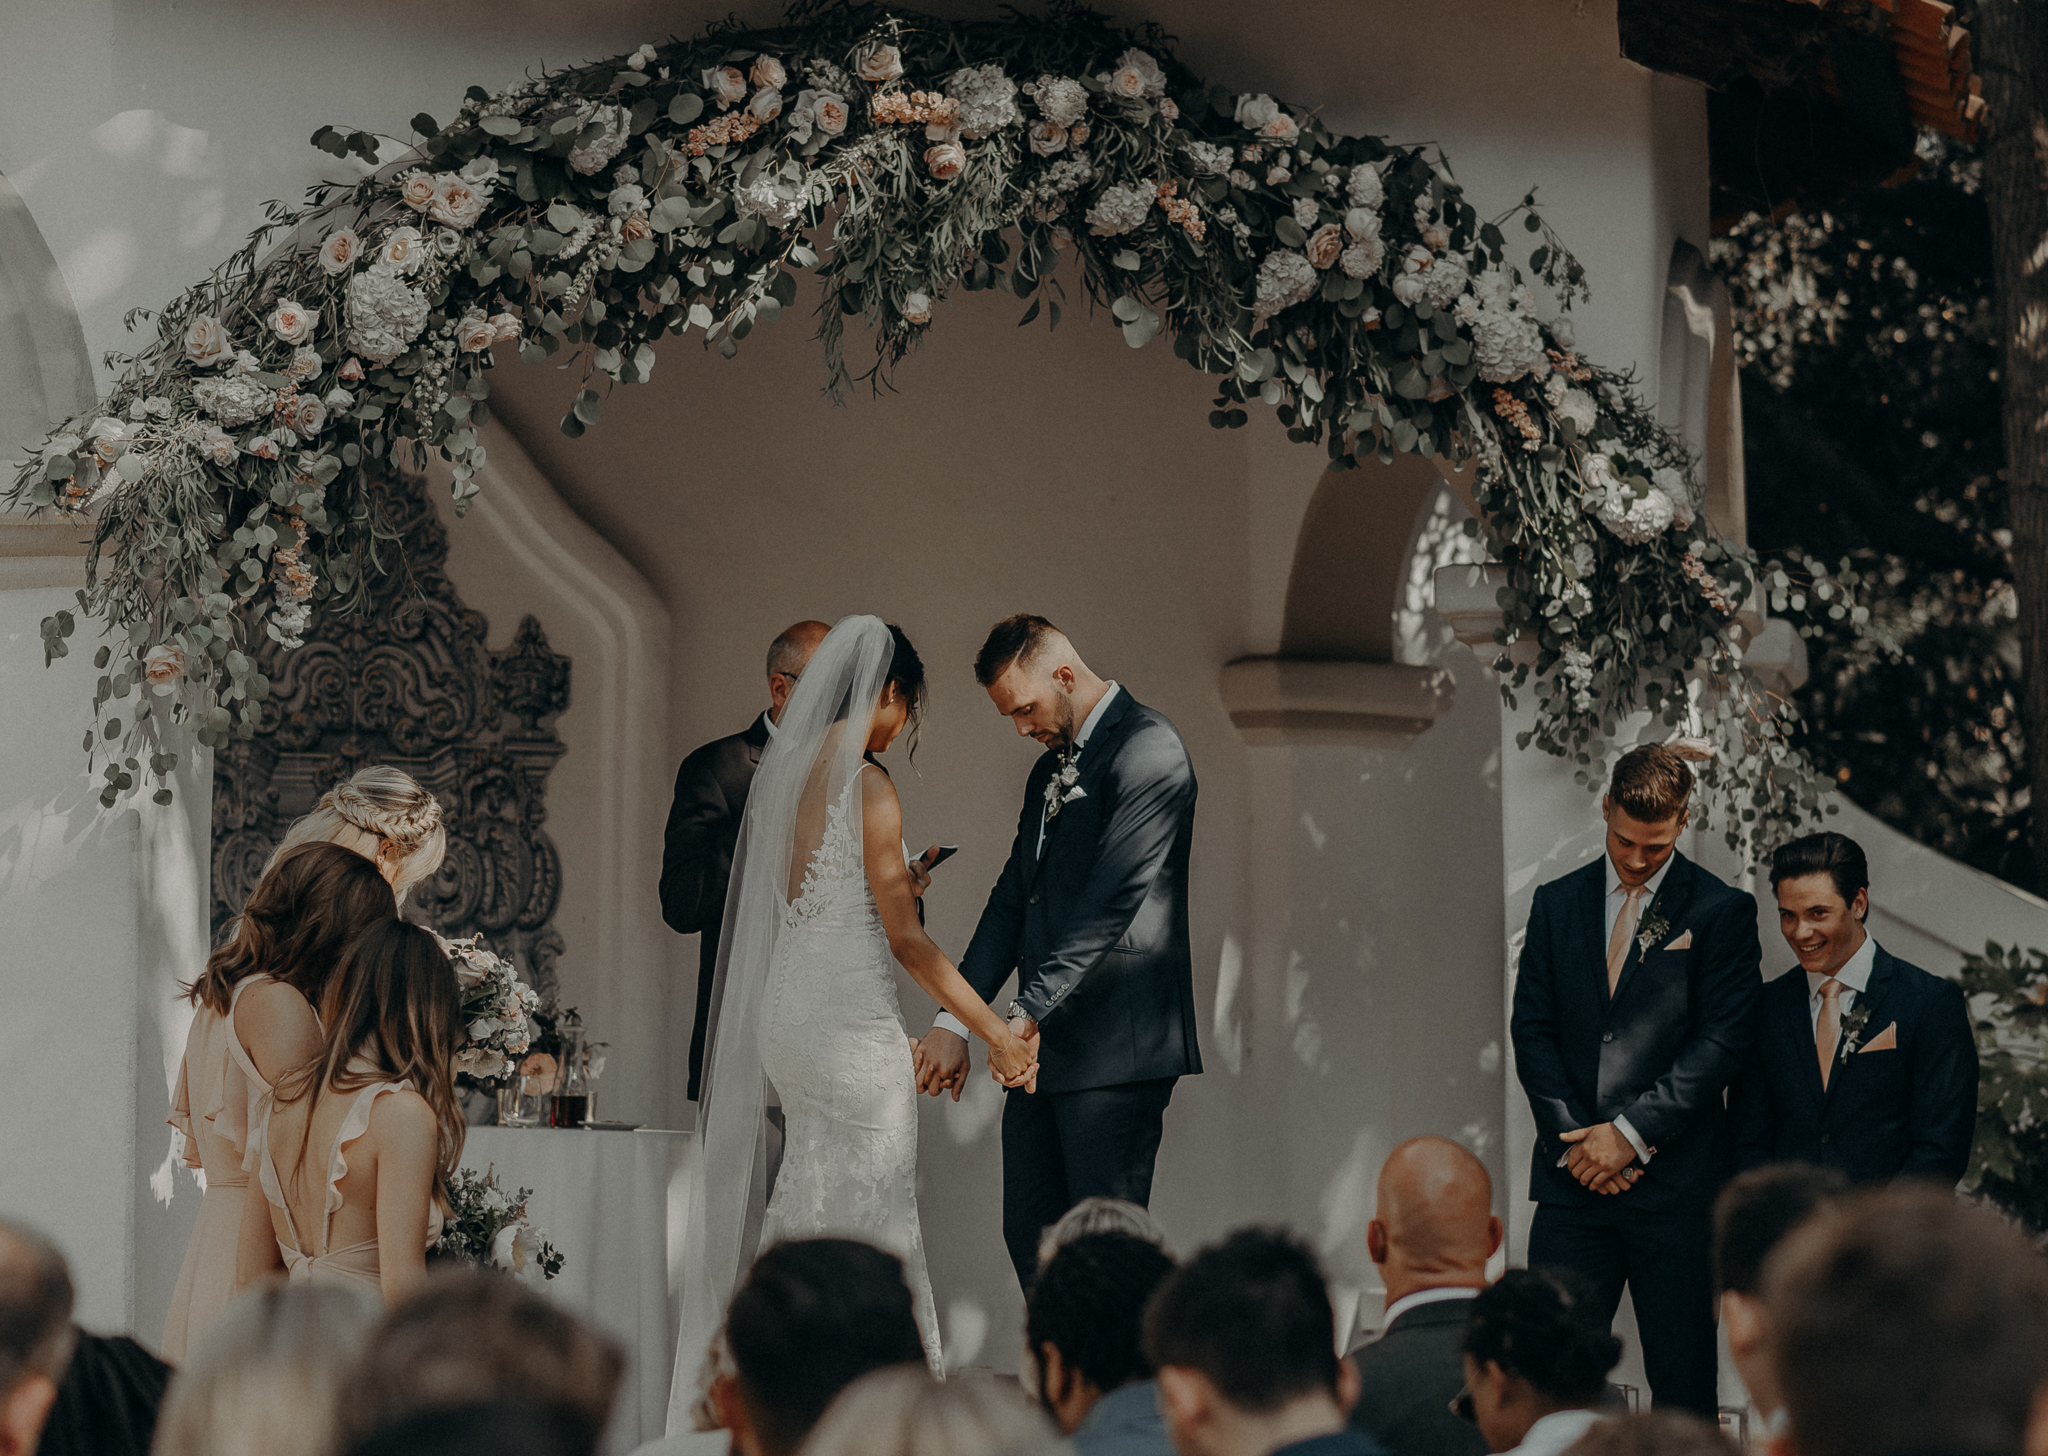 Isaiah + Taylor Photography - Rancho Las Lomas Wedding, Los Angeles Wedding Photographer-057.jpg